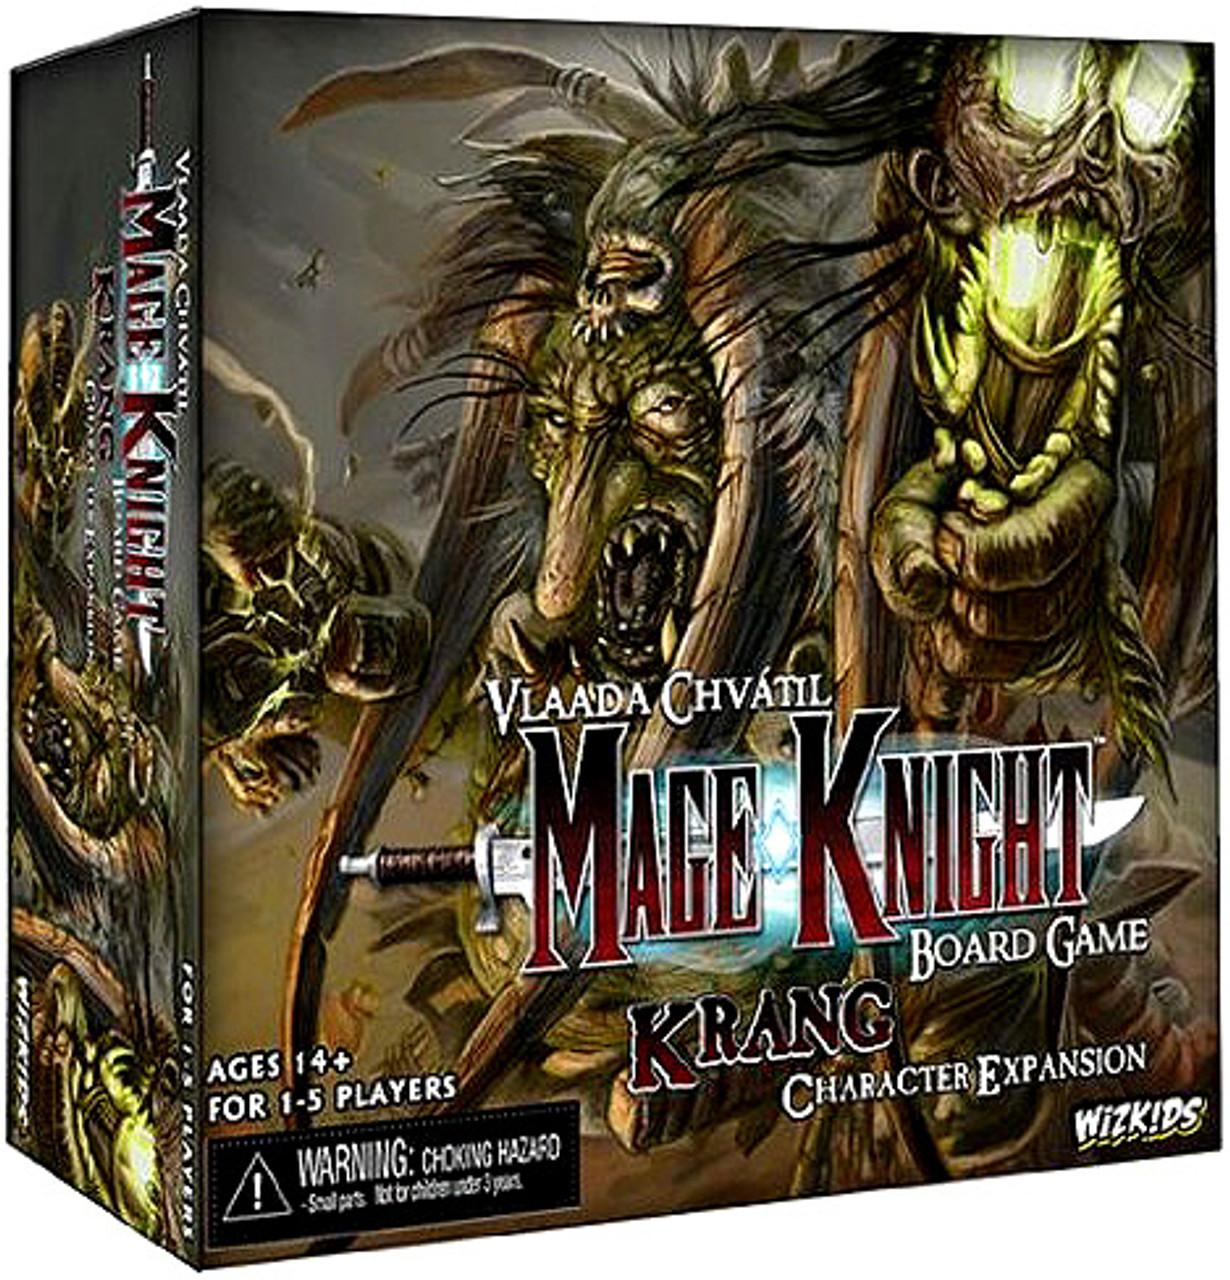 Mage Knight Board Game [Krang Character Expansion]